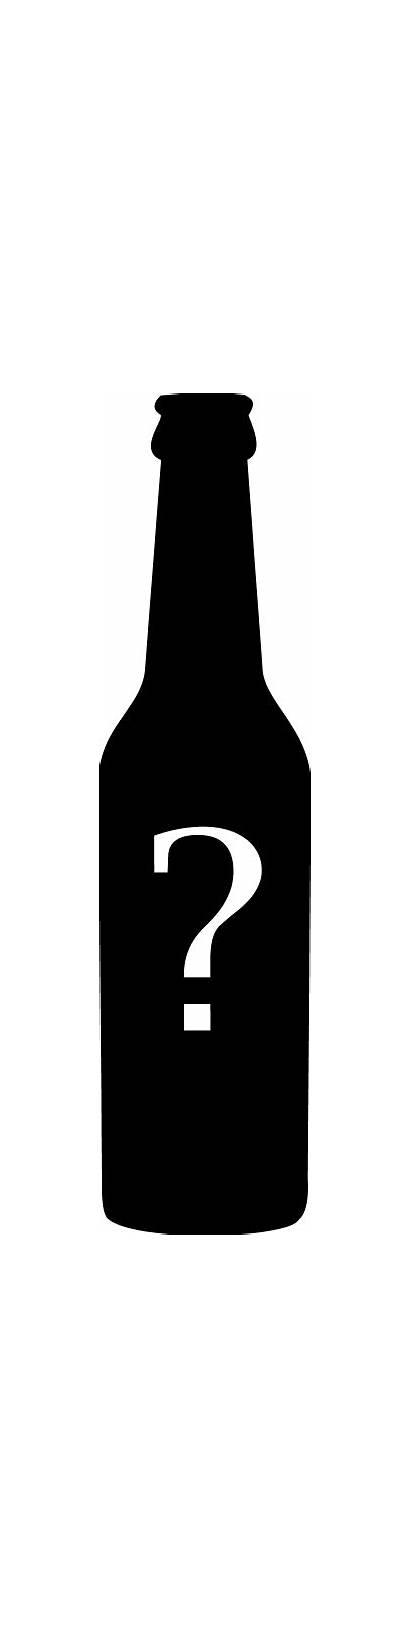 Bottle Beer Silhouette Mystery Gabby Marketing Wonderful